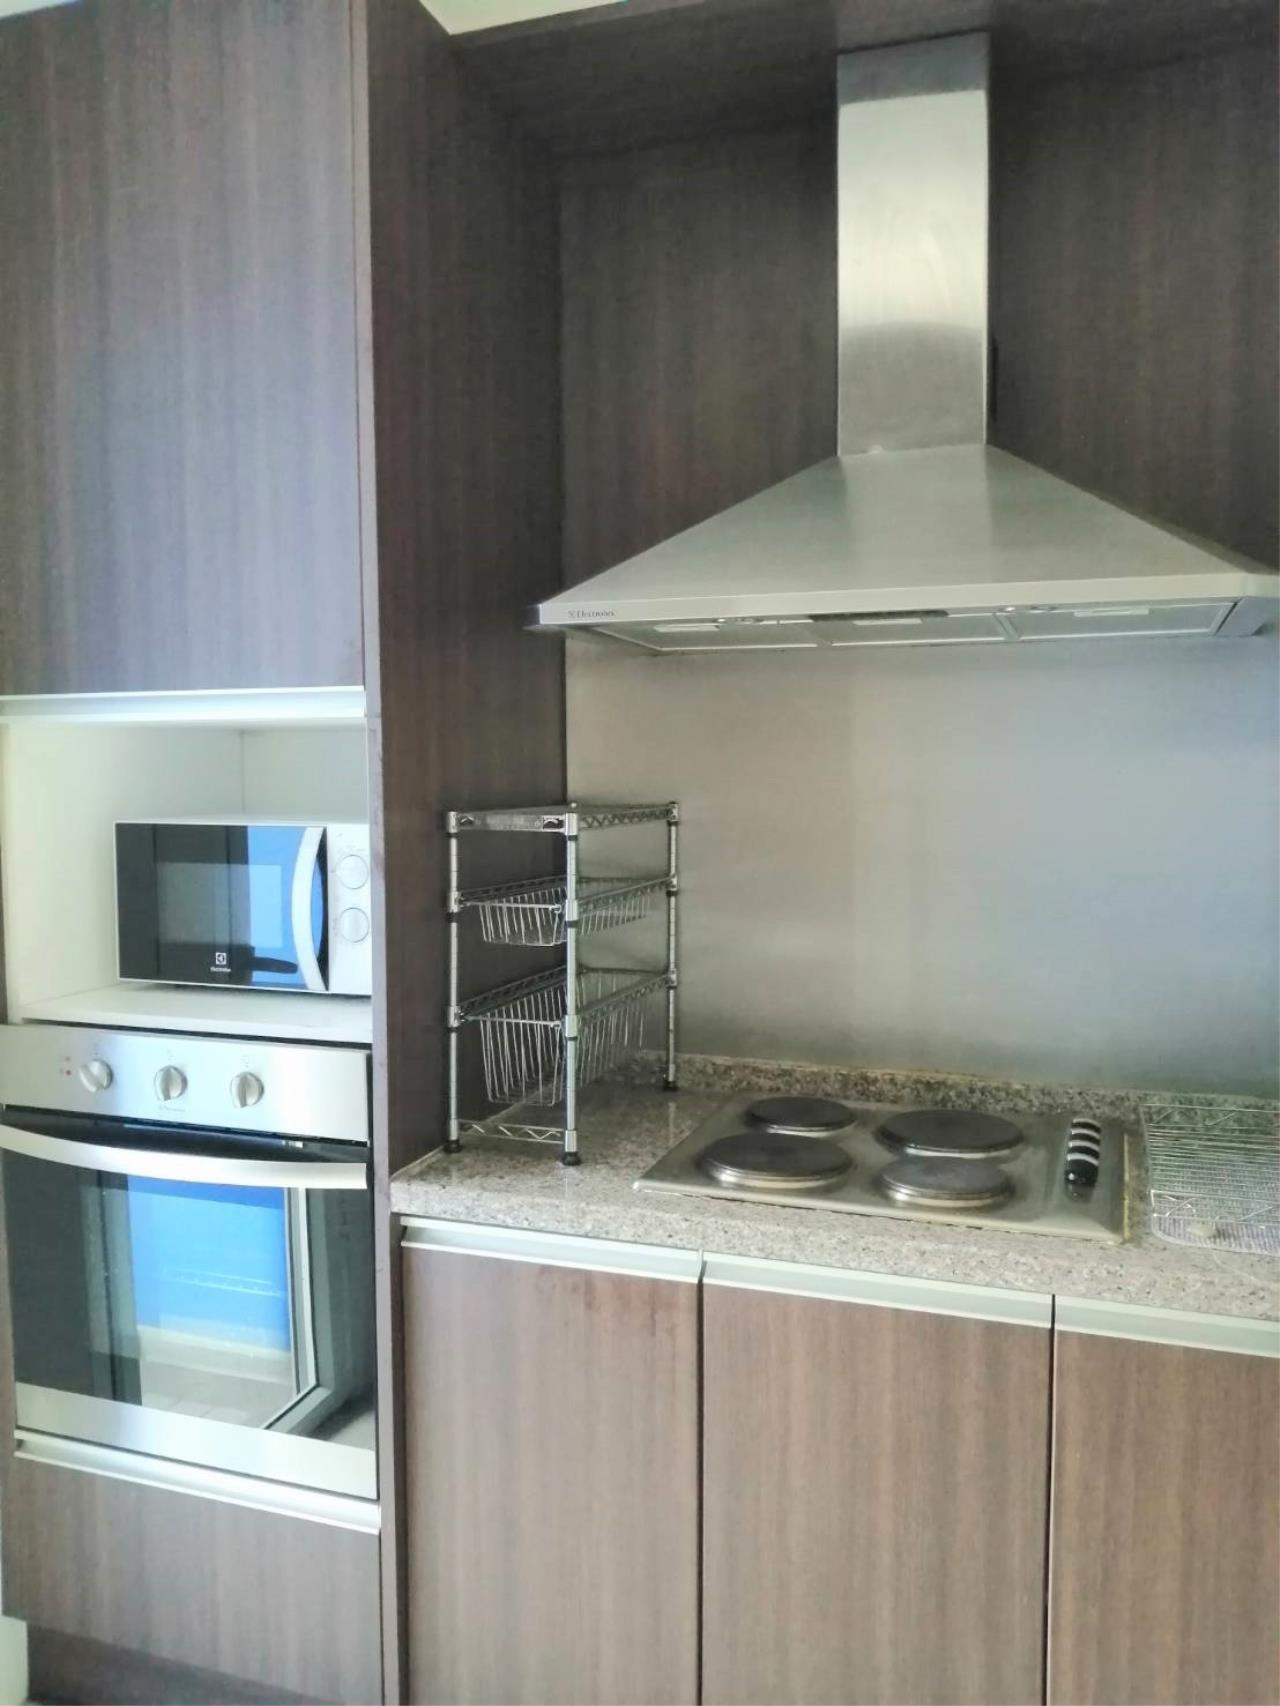 Blueocean property Agency's Condo For Rent – Avenue 61 Condominium 7